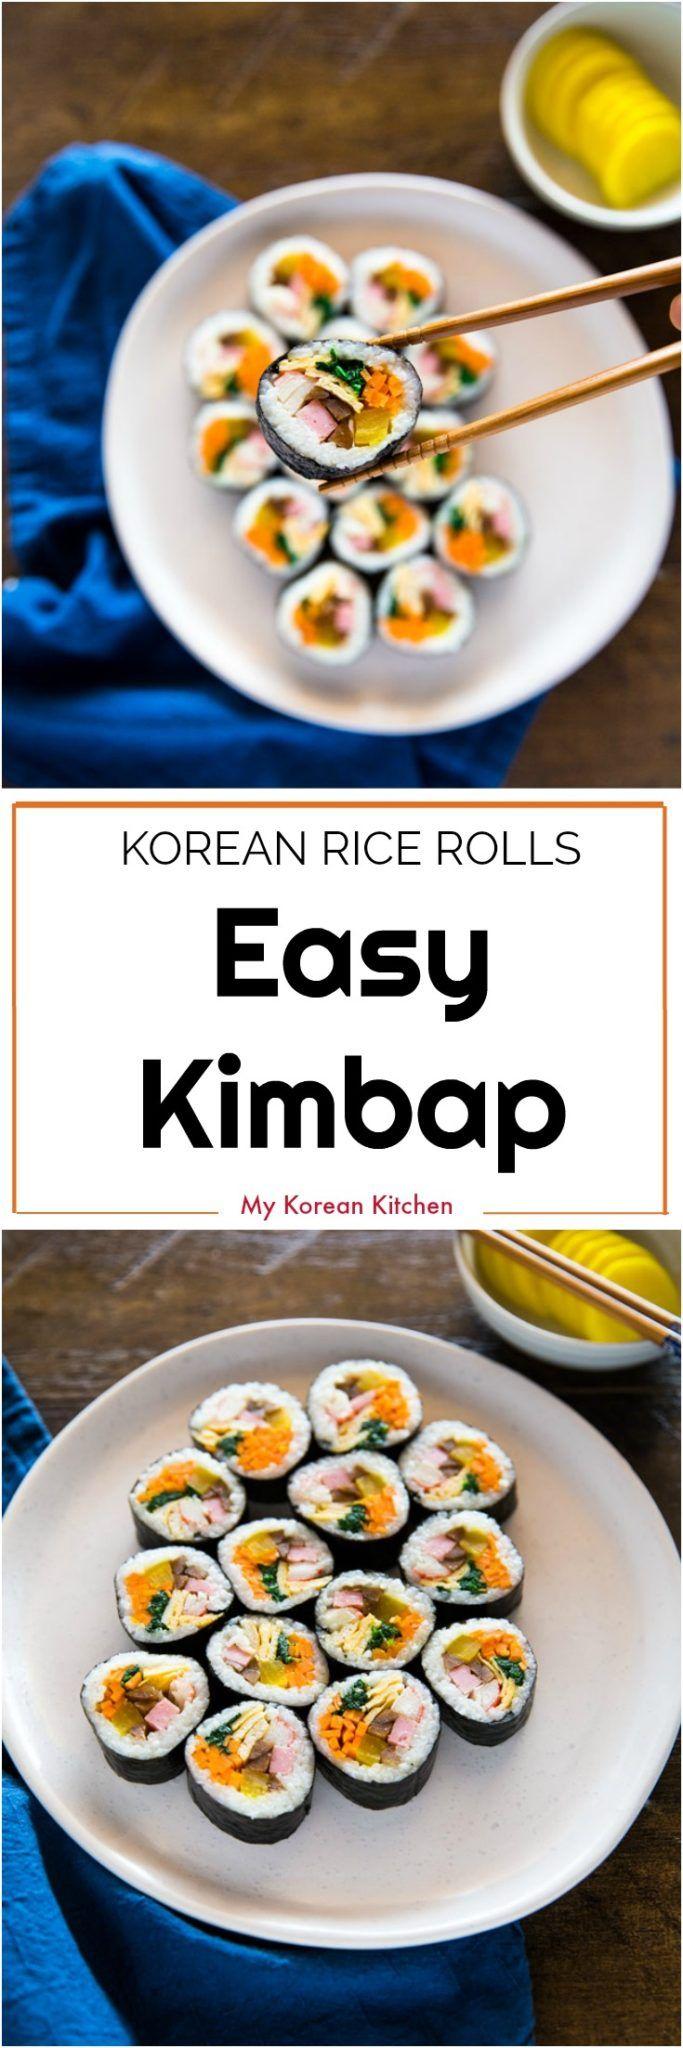 Easy Kimbap (Korean sushi rolls) Recipe | MyKoreanKitchen.com #koreanfood #gimbap #kimbap #sushiroll